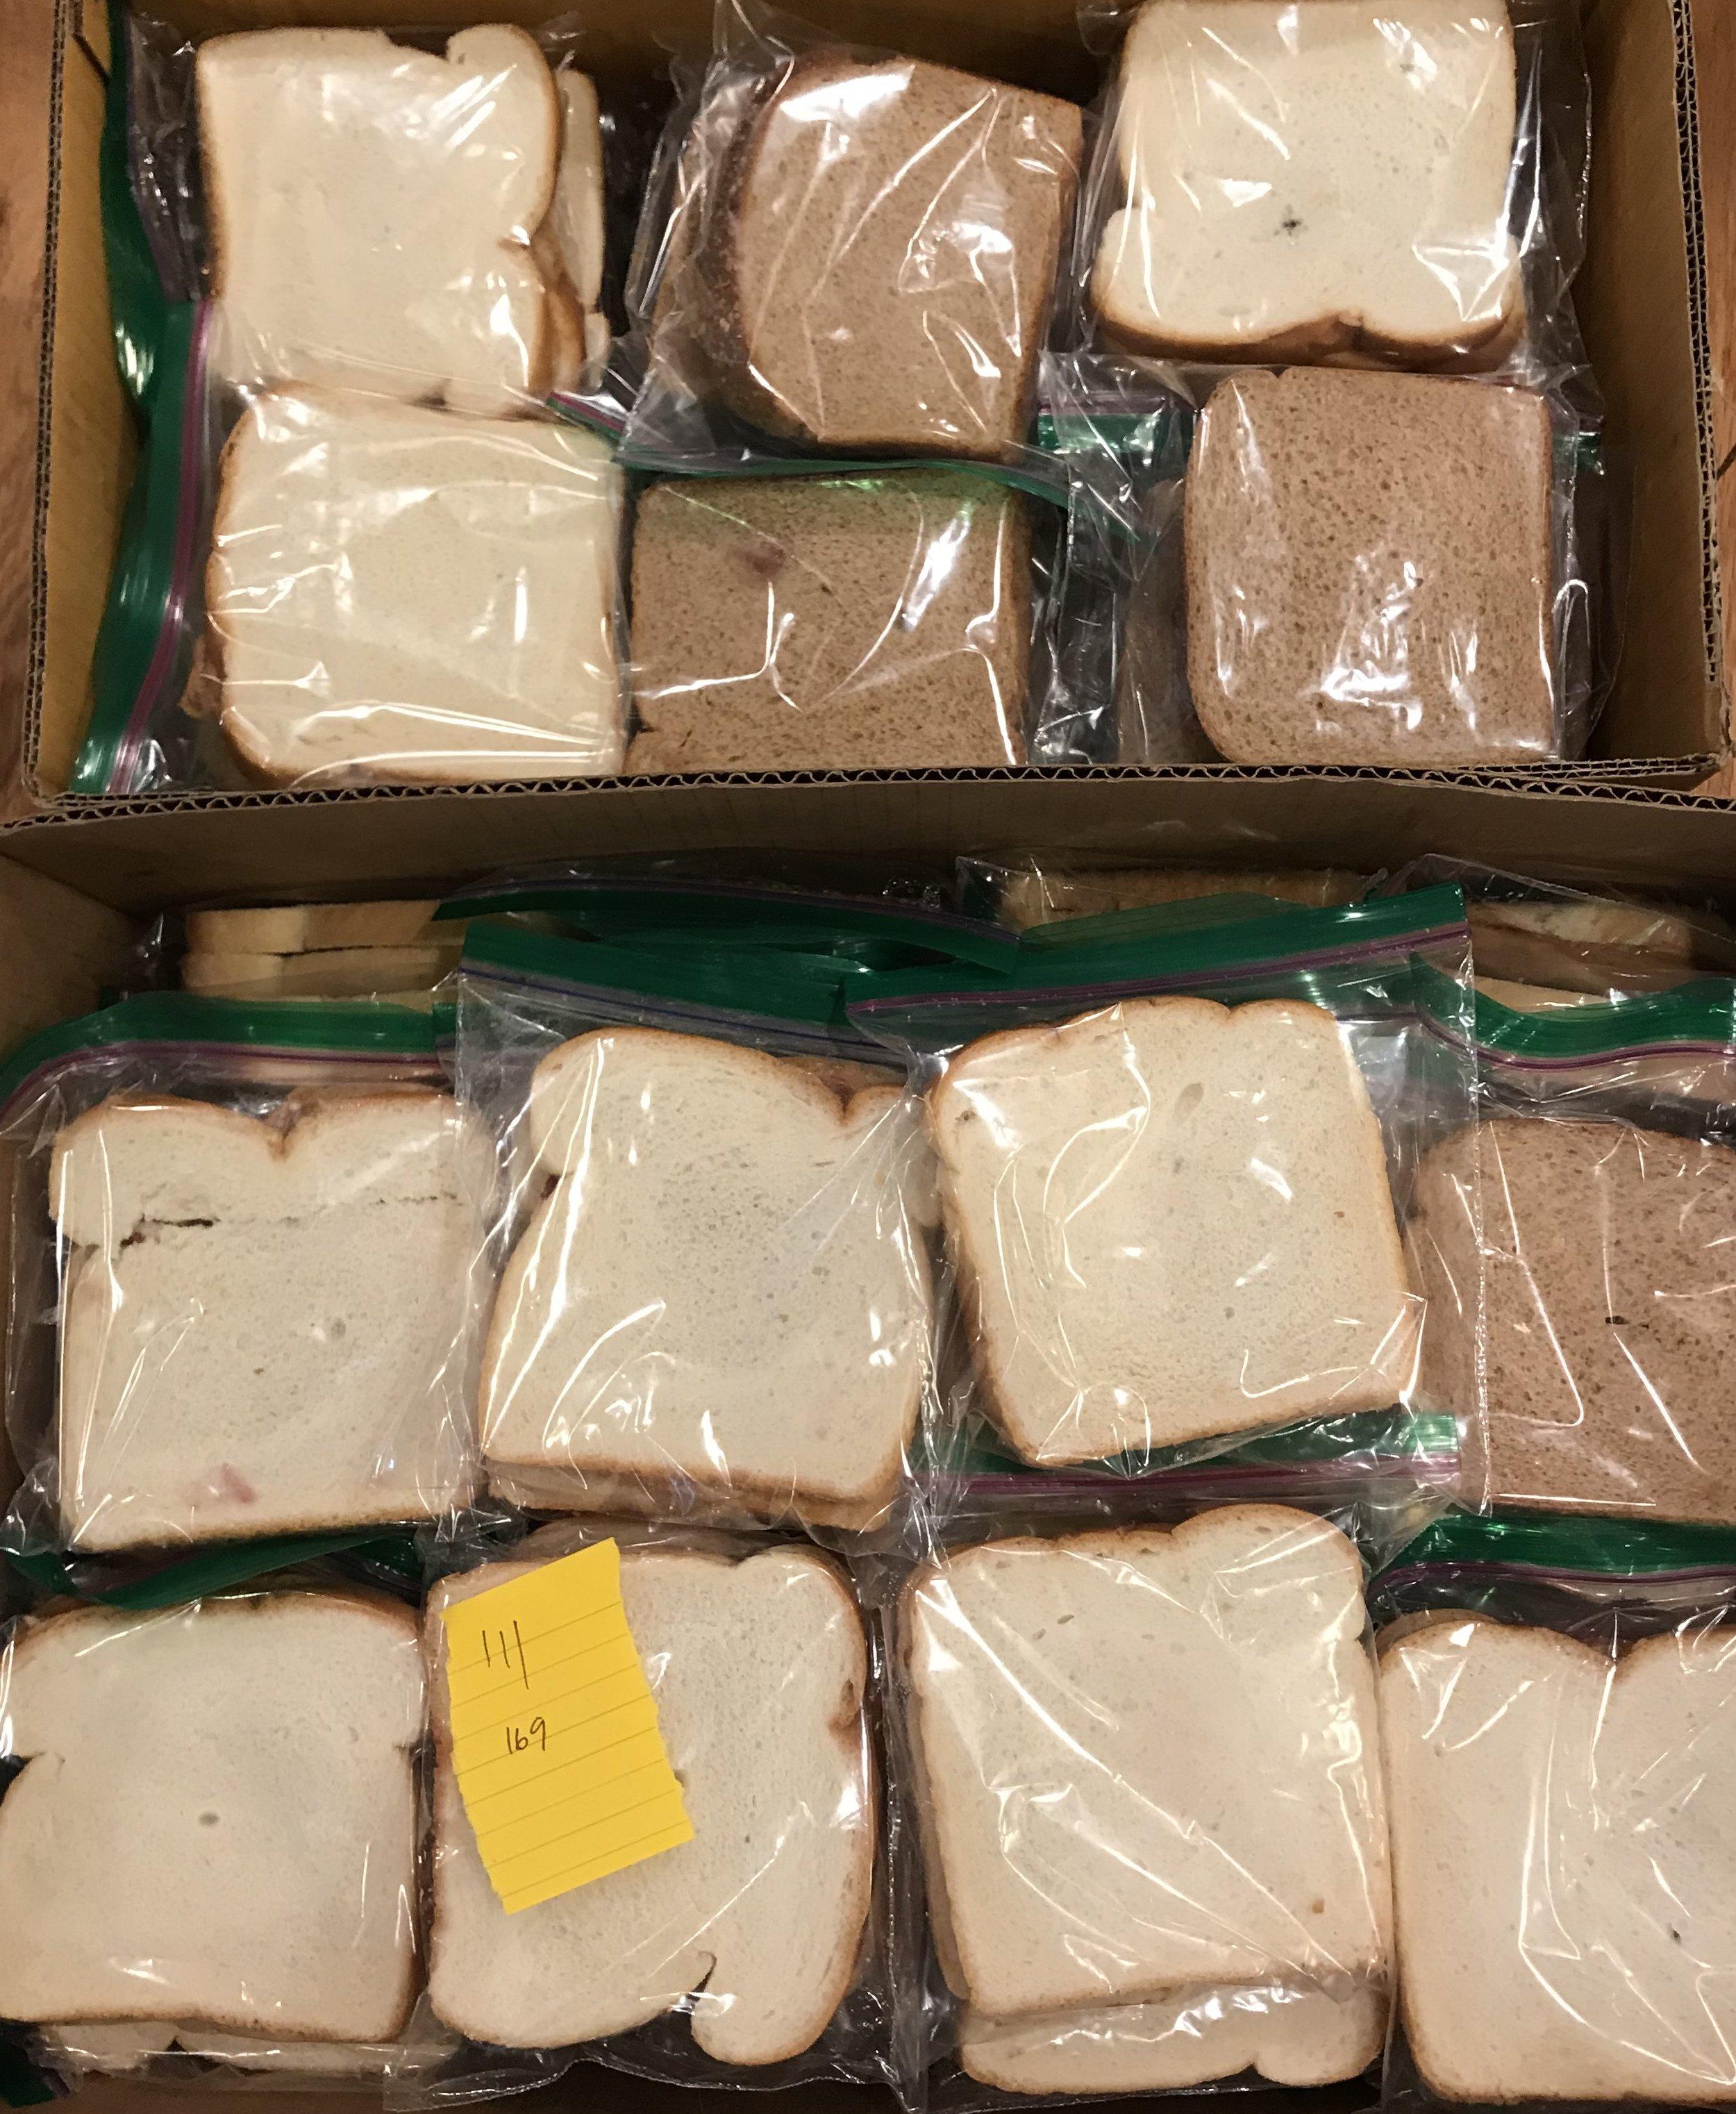 May_01_02_Sandwiches.JPG